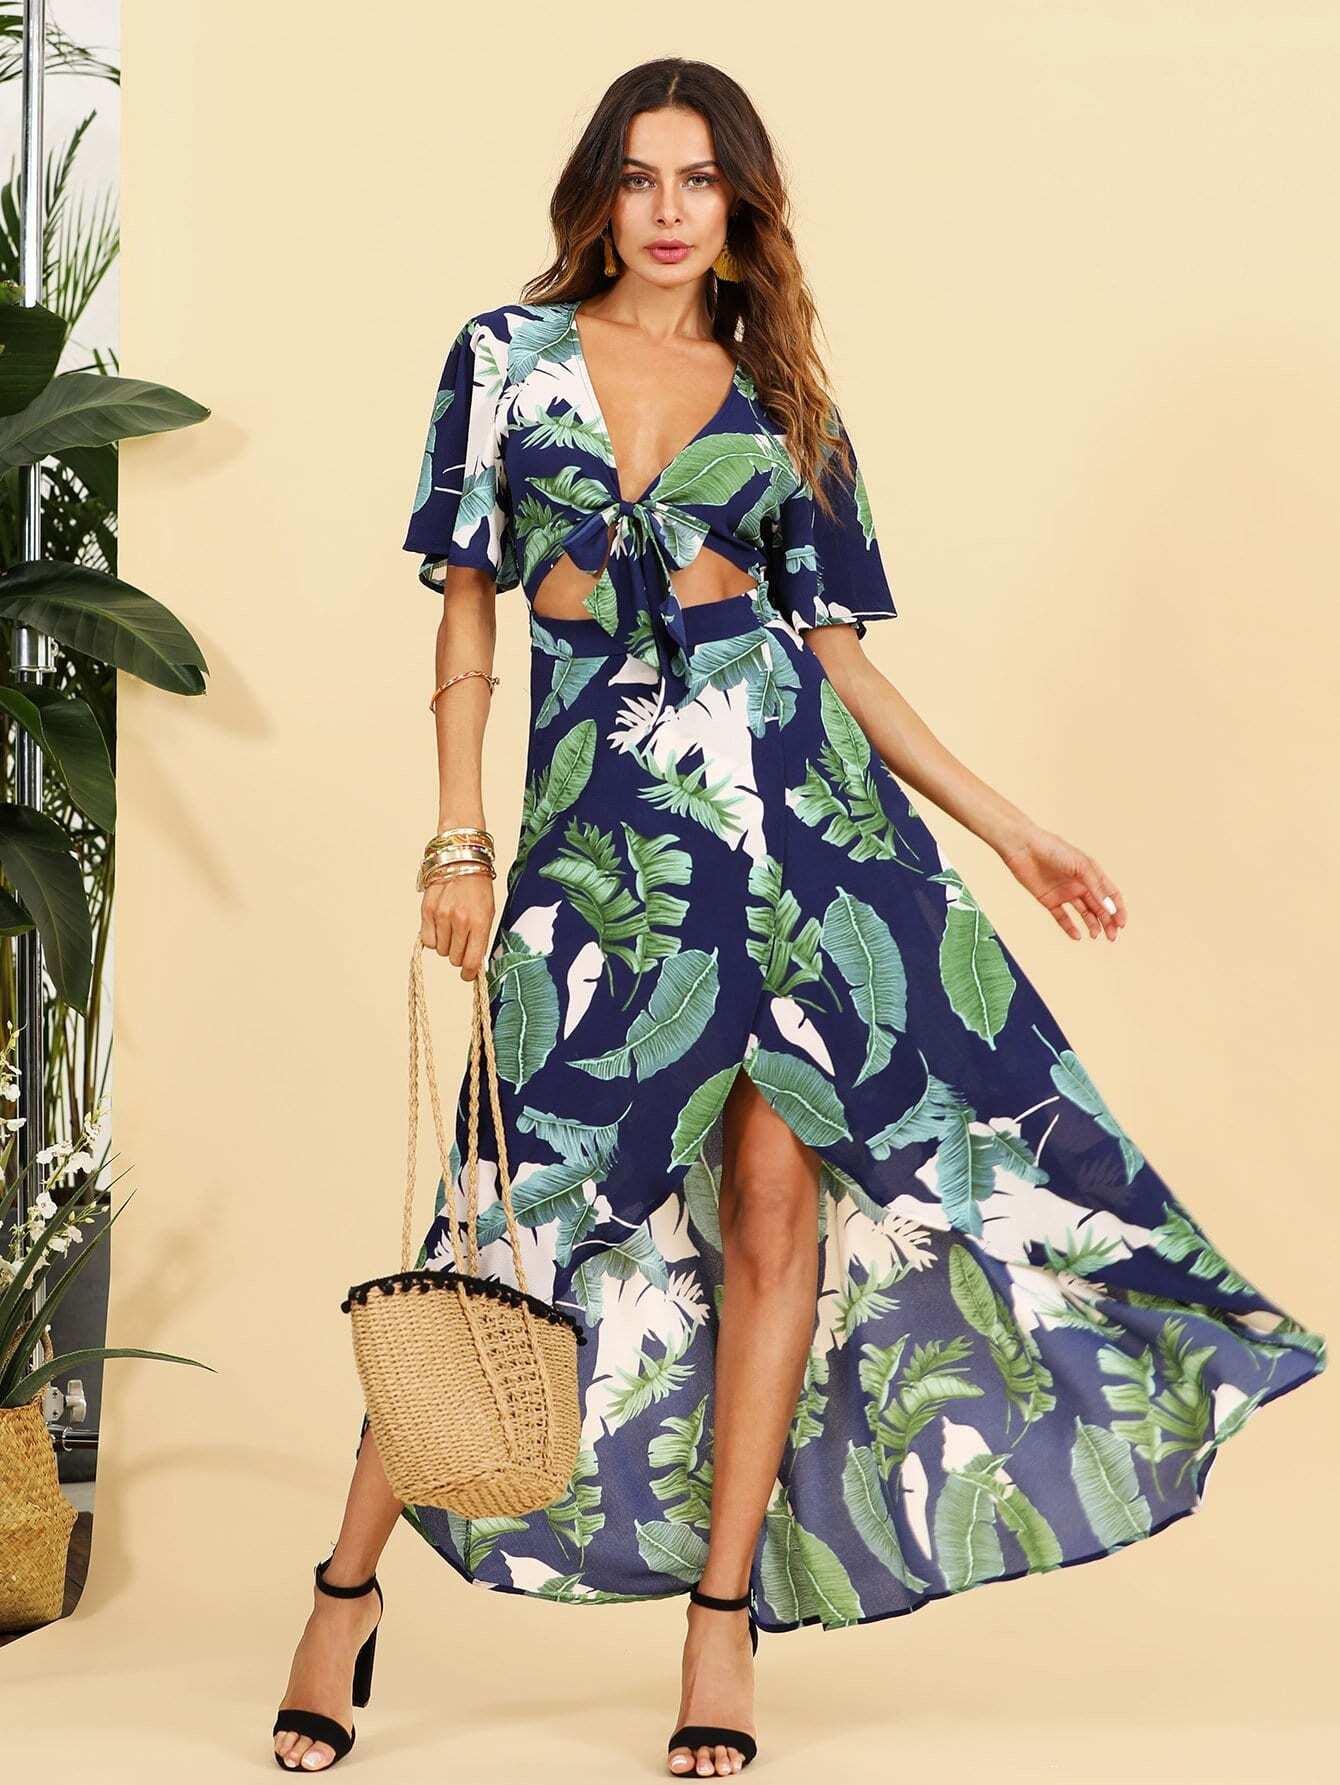 Open Midriff Knot Front Jungle Dress knot front cutout midriff halterneck gingham dress